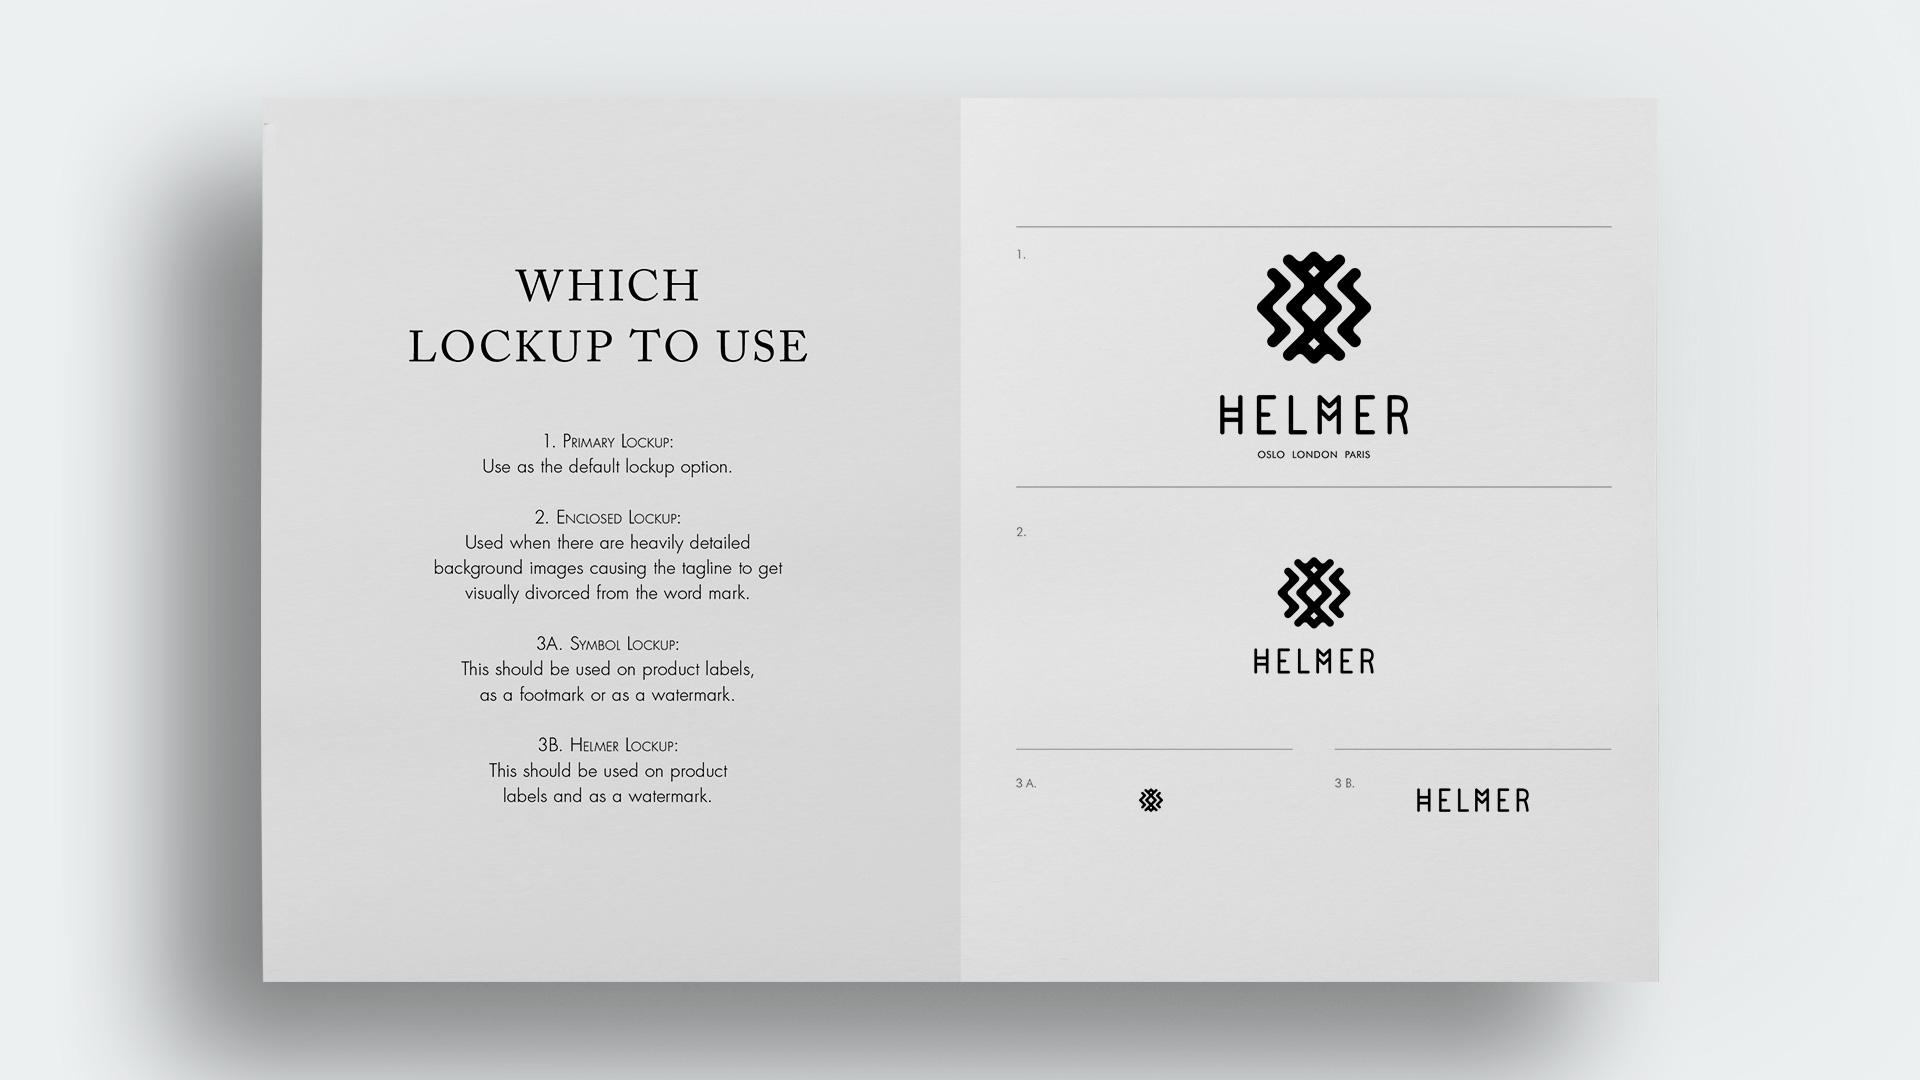 helmer_BB_02